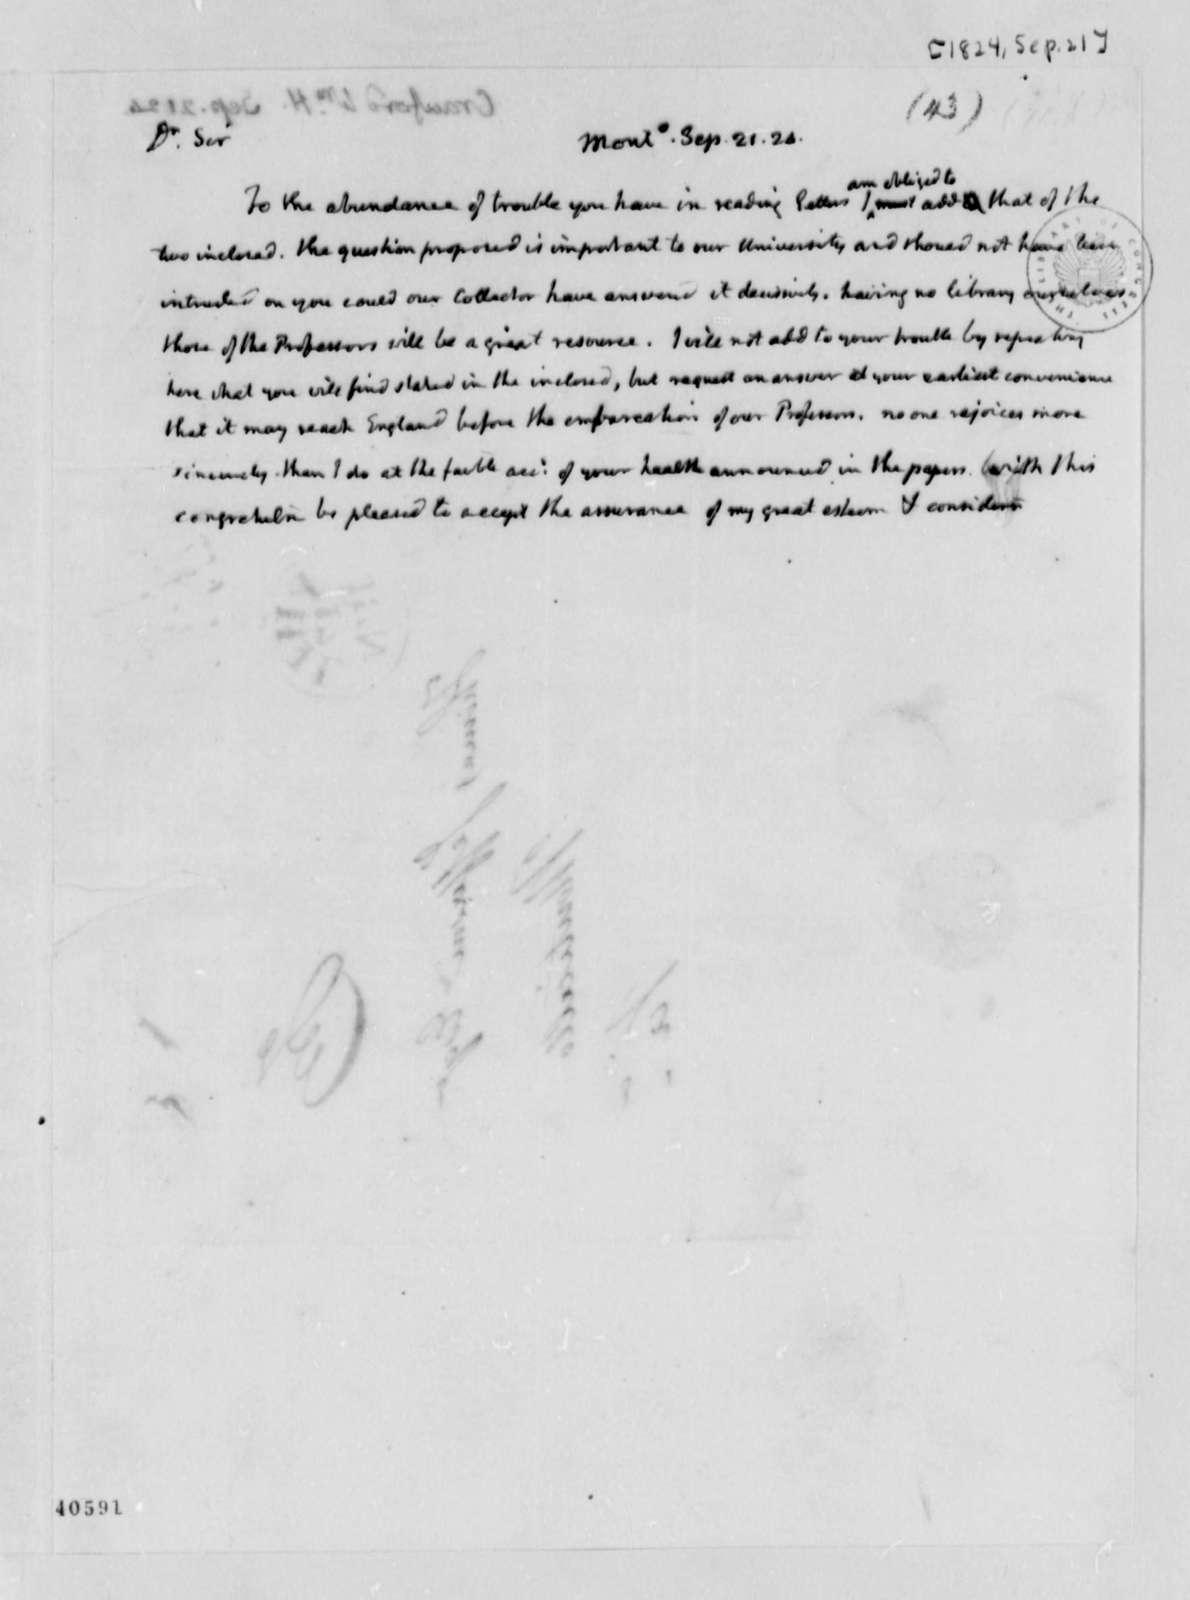 Thomas Jefferson to William H. Crawford, September 21, 1824